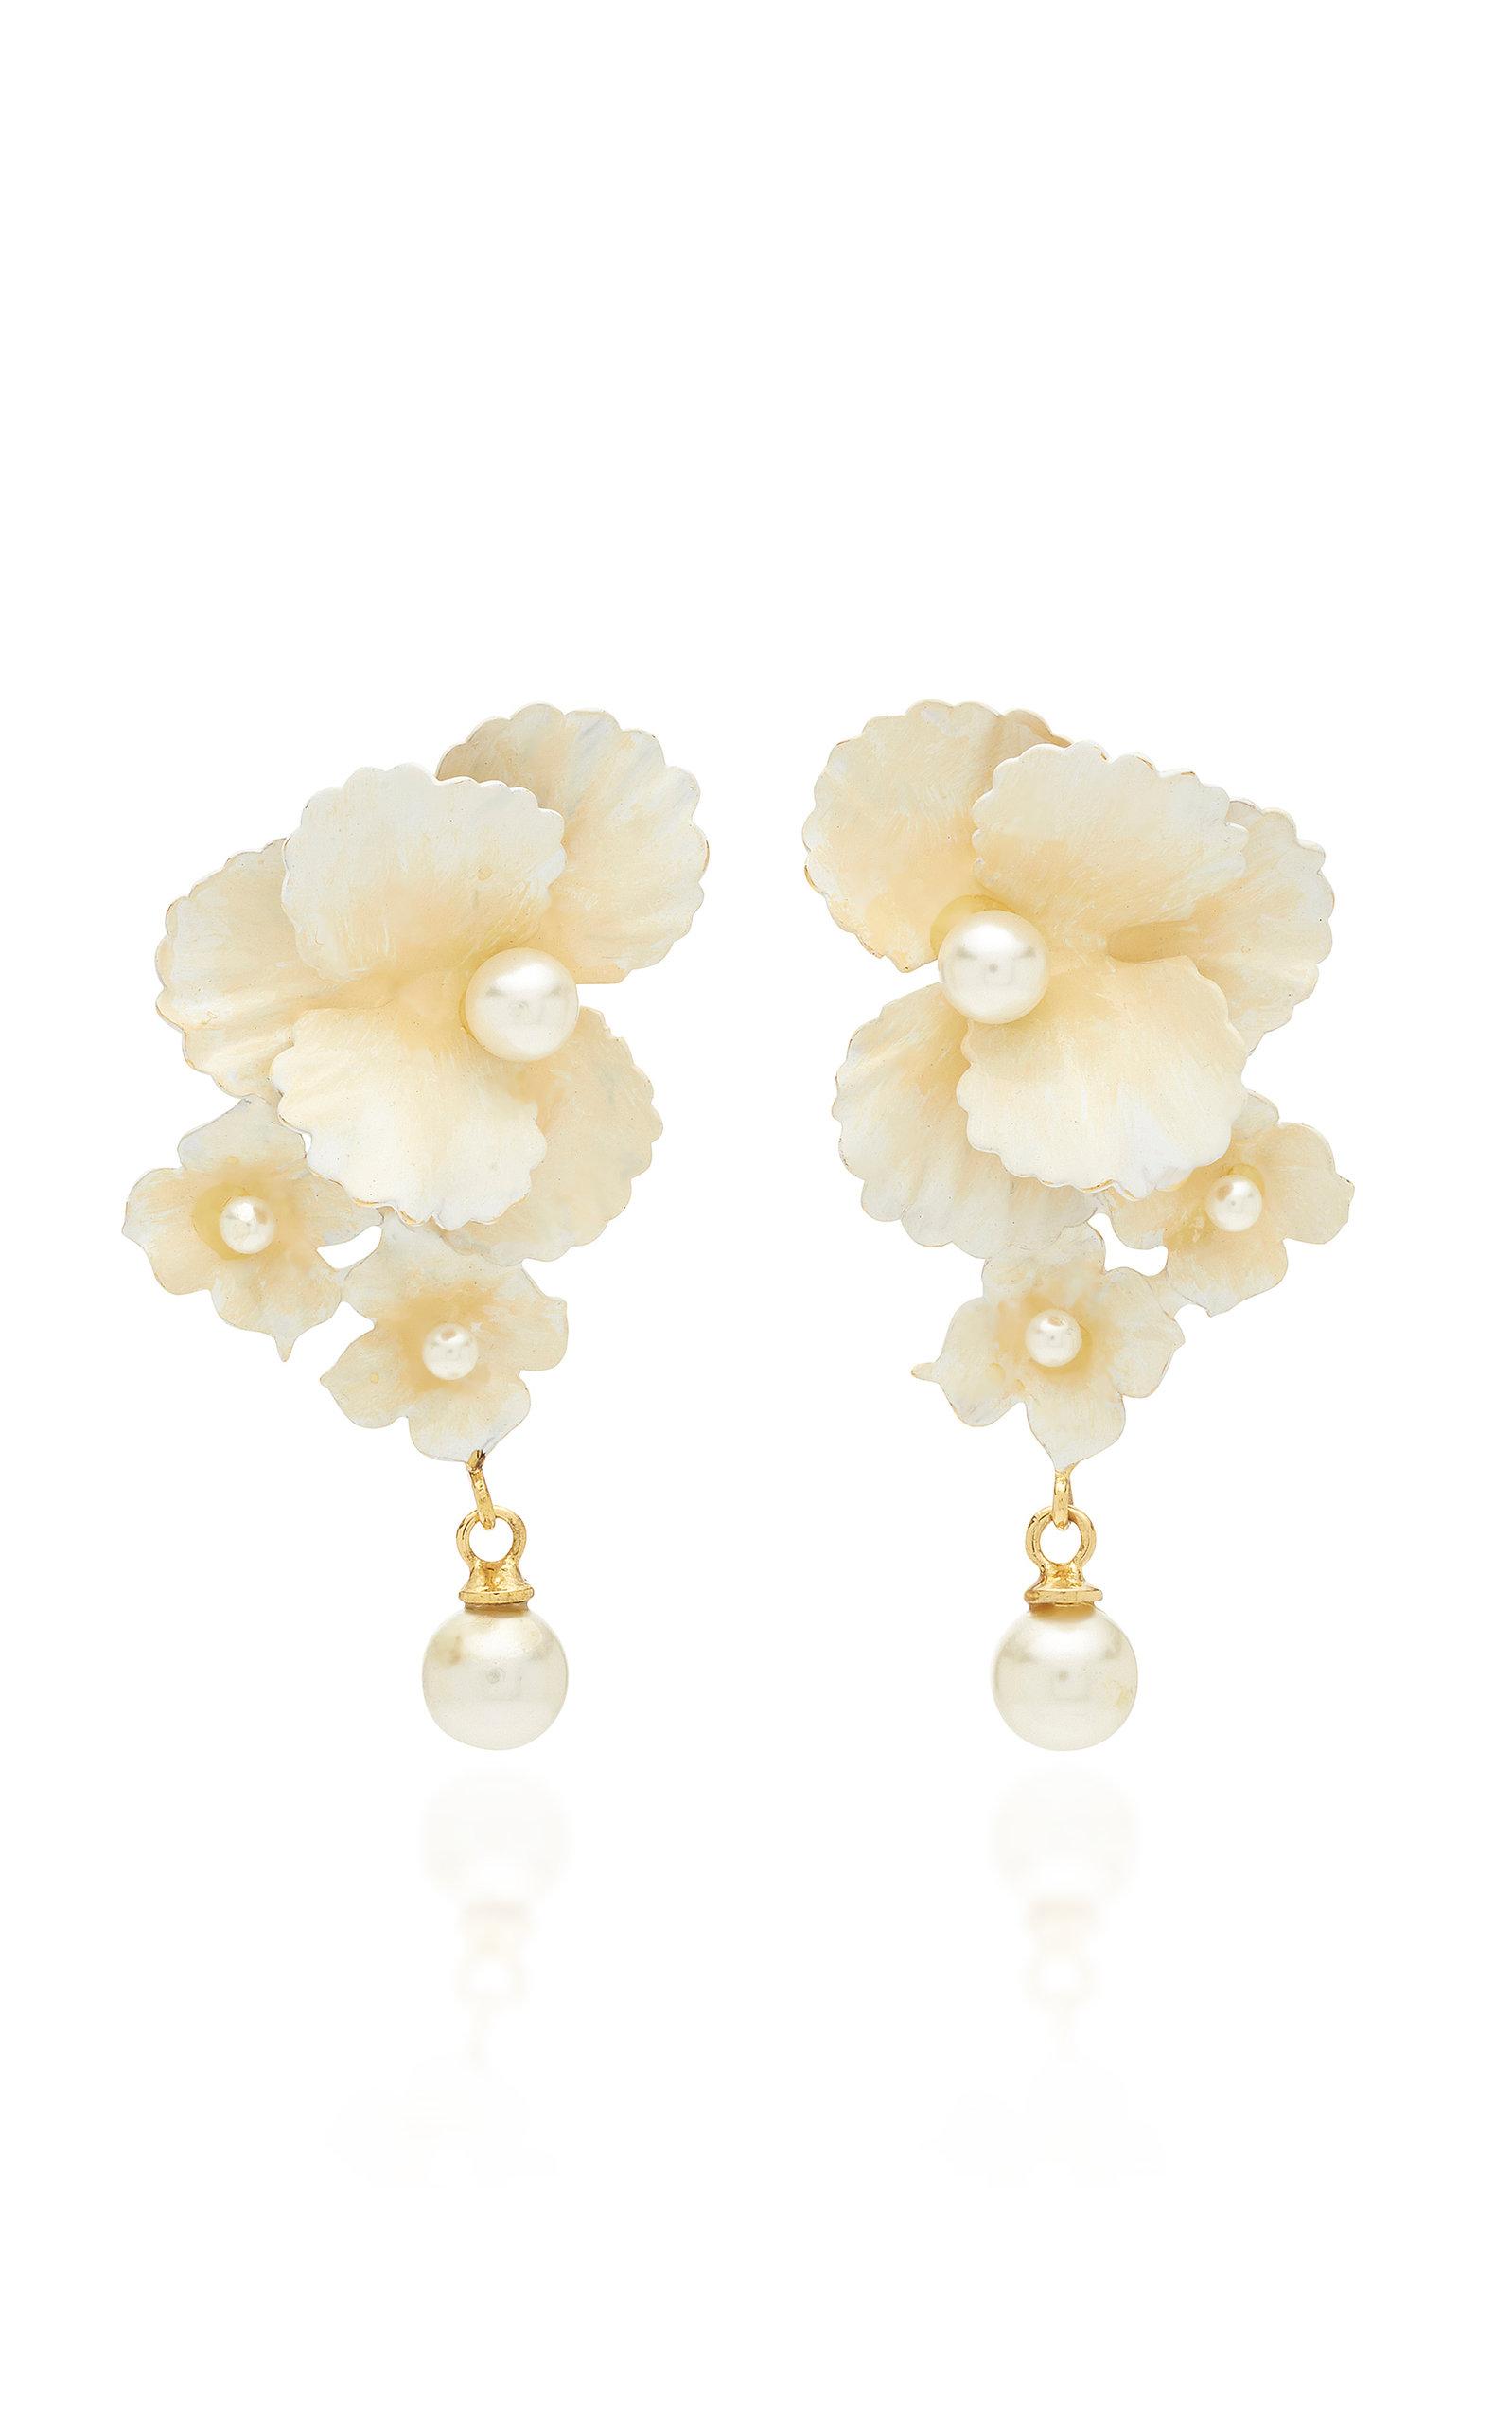 904fb2e93 Sadira Gold-Tone Faux-Pearl Earrings by Jennifer Behr | Moda Operandi